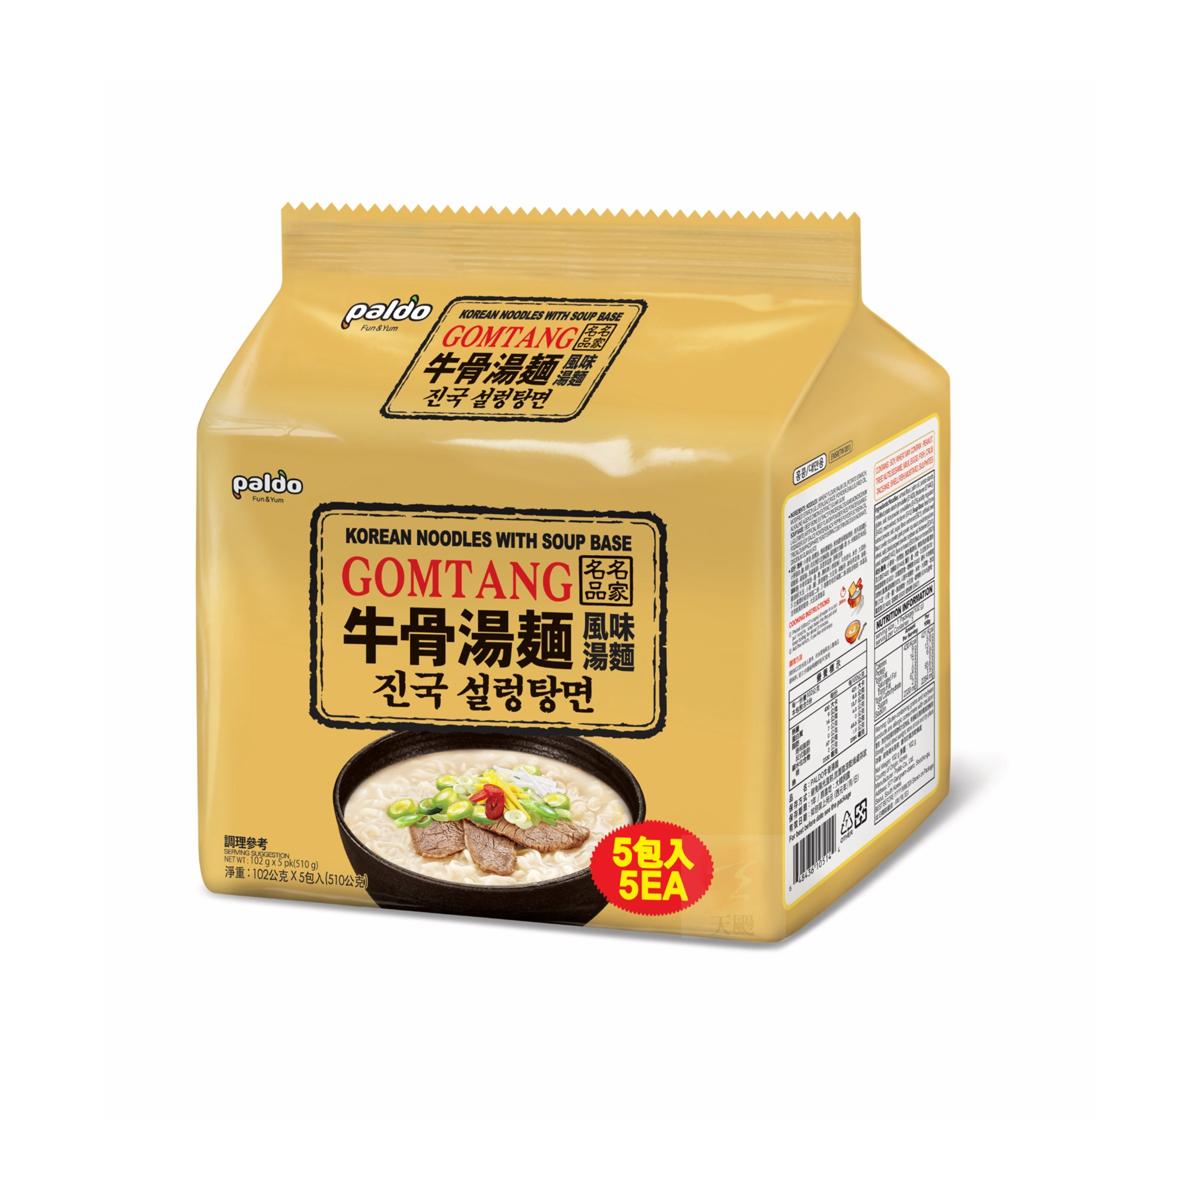 Kit Lamen Coreano Gomtang Sabor Carne Temperada Paldo 102 gramas - 5 pacotes